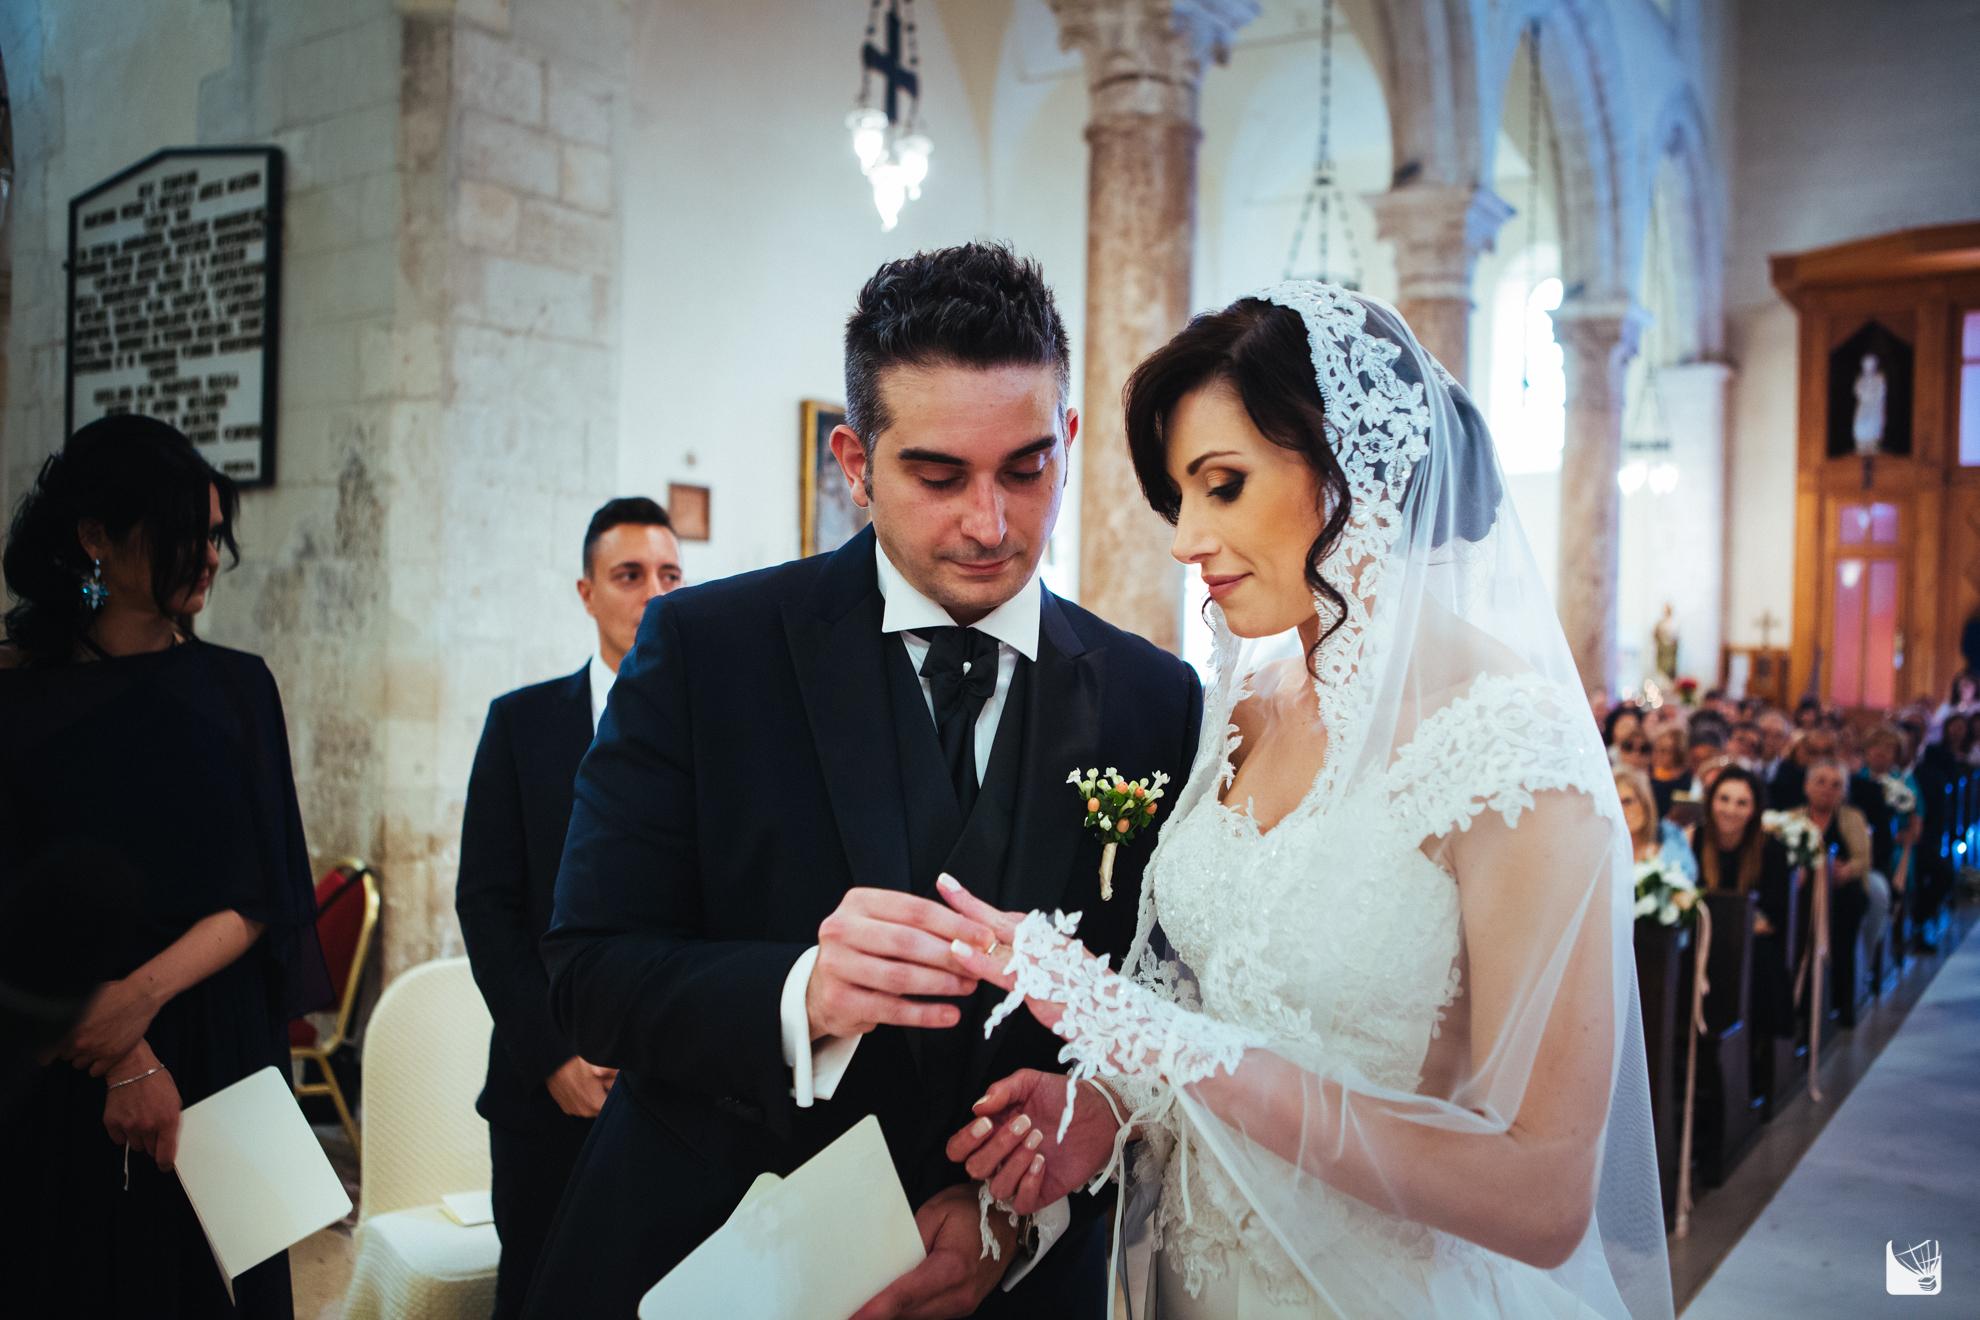 fotografo_matrimonio_catania_LV-21.jpg